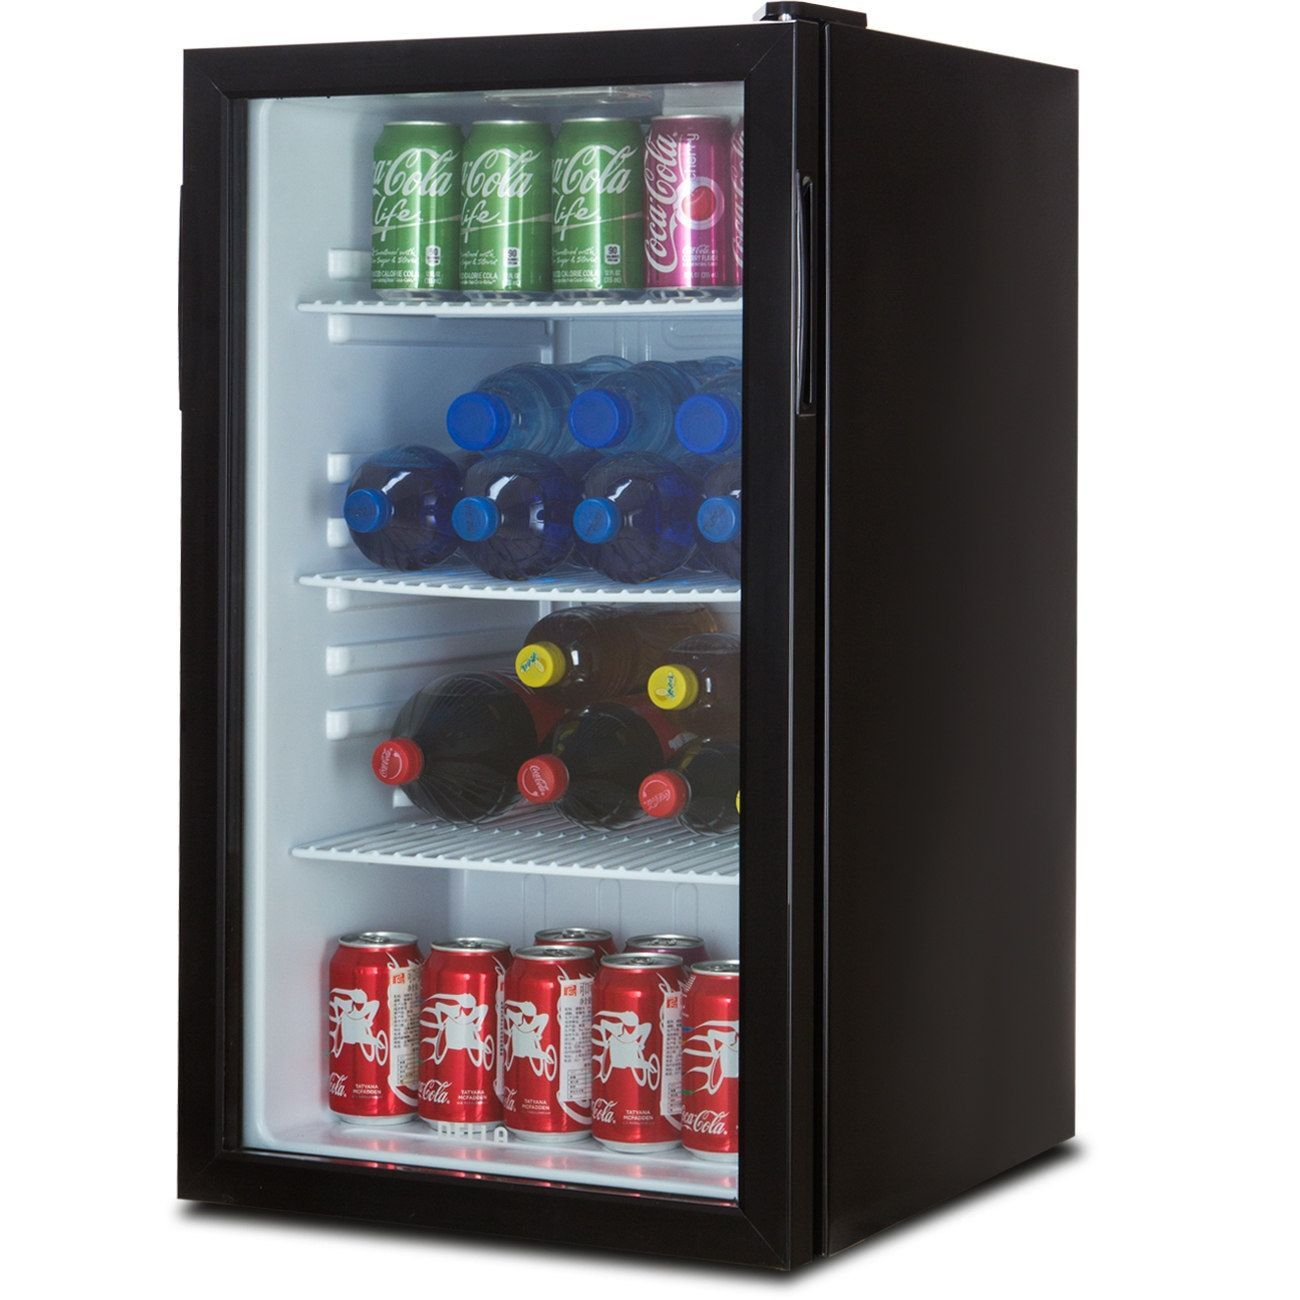 Della Beverage Refrigerator Cooler Compact Mini Bar Fridge Beer Soda Pop Reversible Glass Door Black